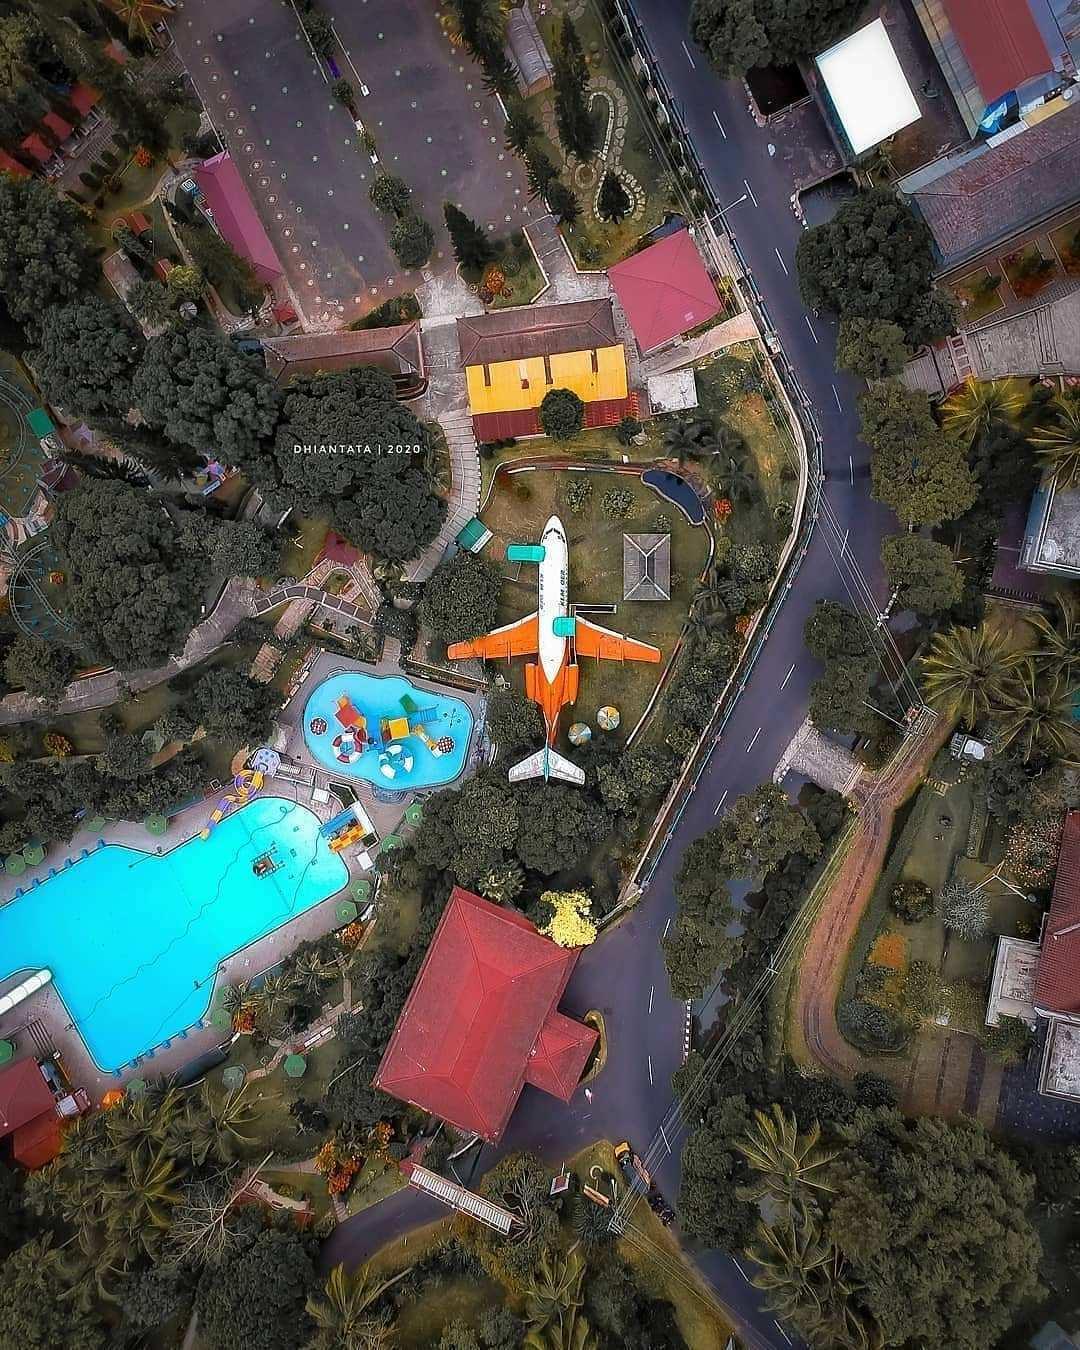 Taman Kyai Langgeng Magelang Dilihat Dari Atas Image From @dhian_hardjodisastro